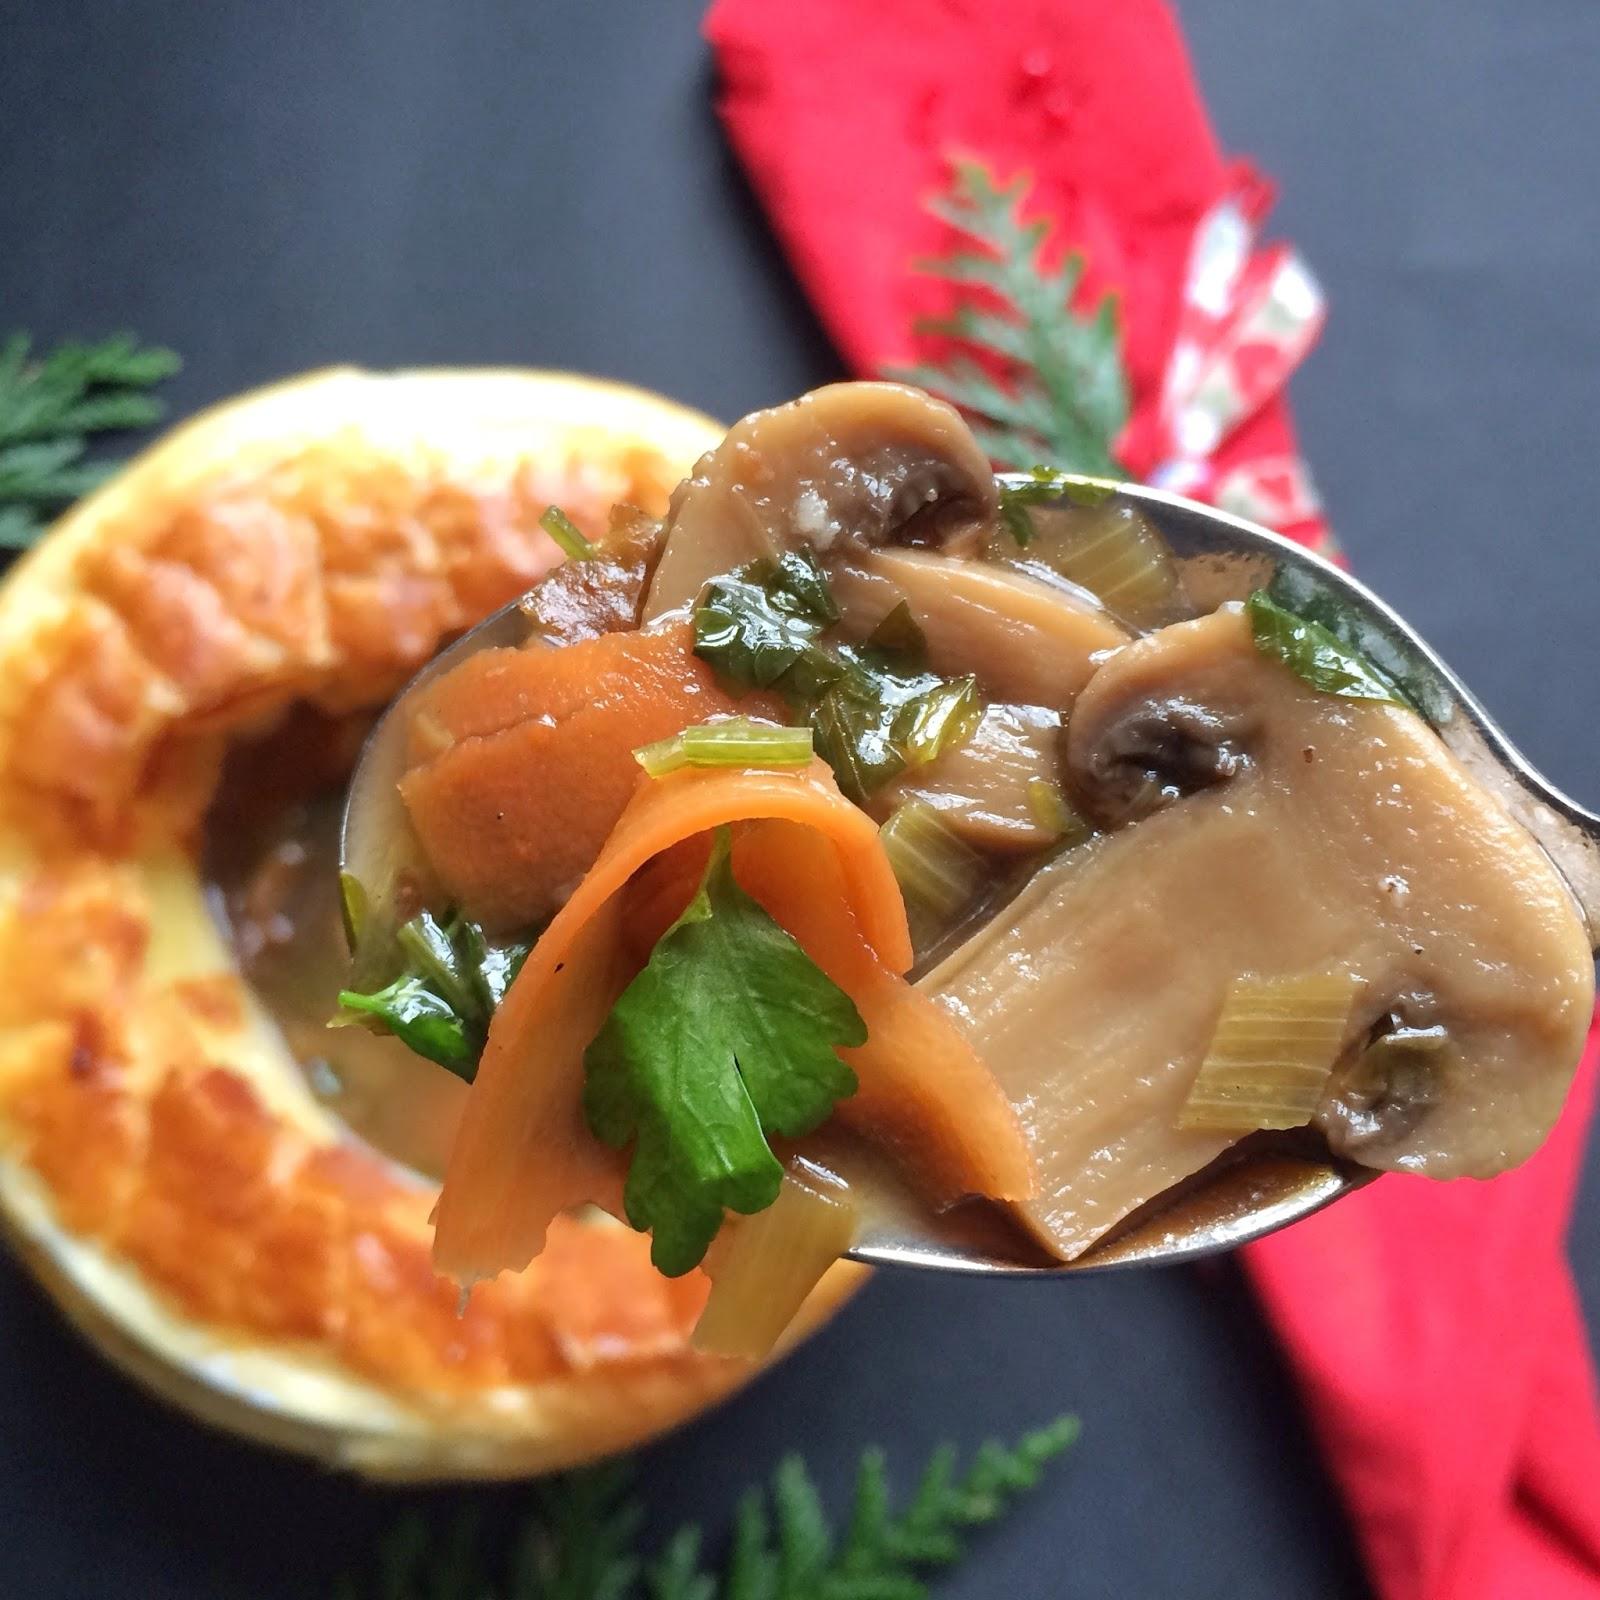 zupa grzybowa, ptysiu mietowy